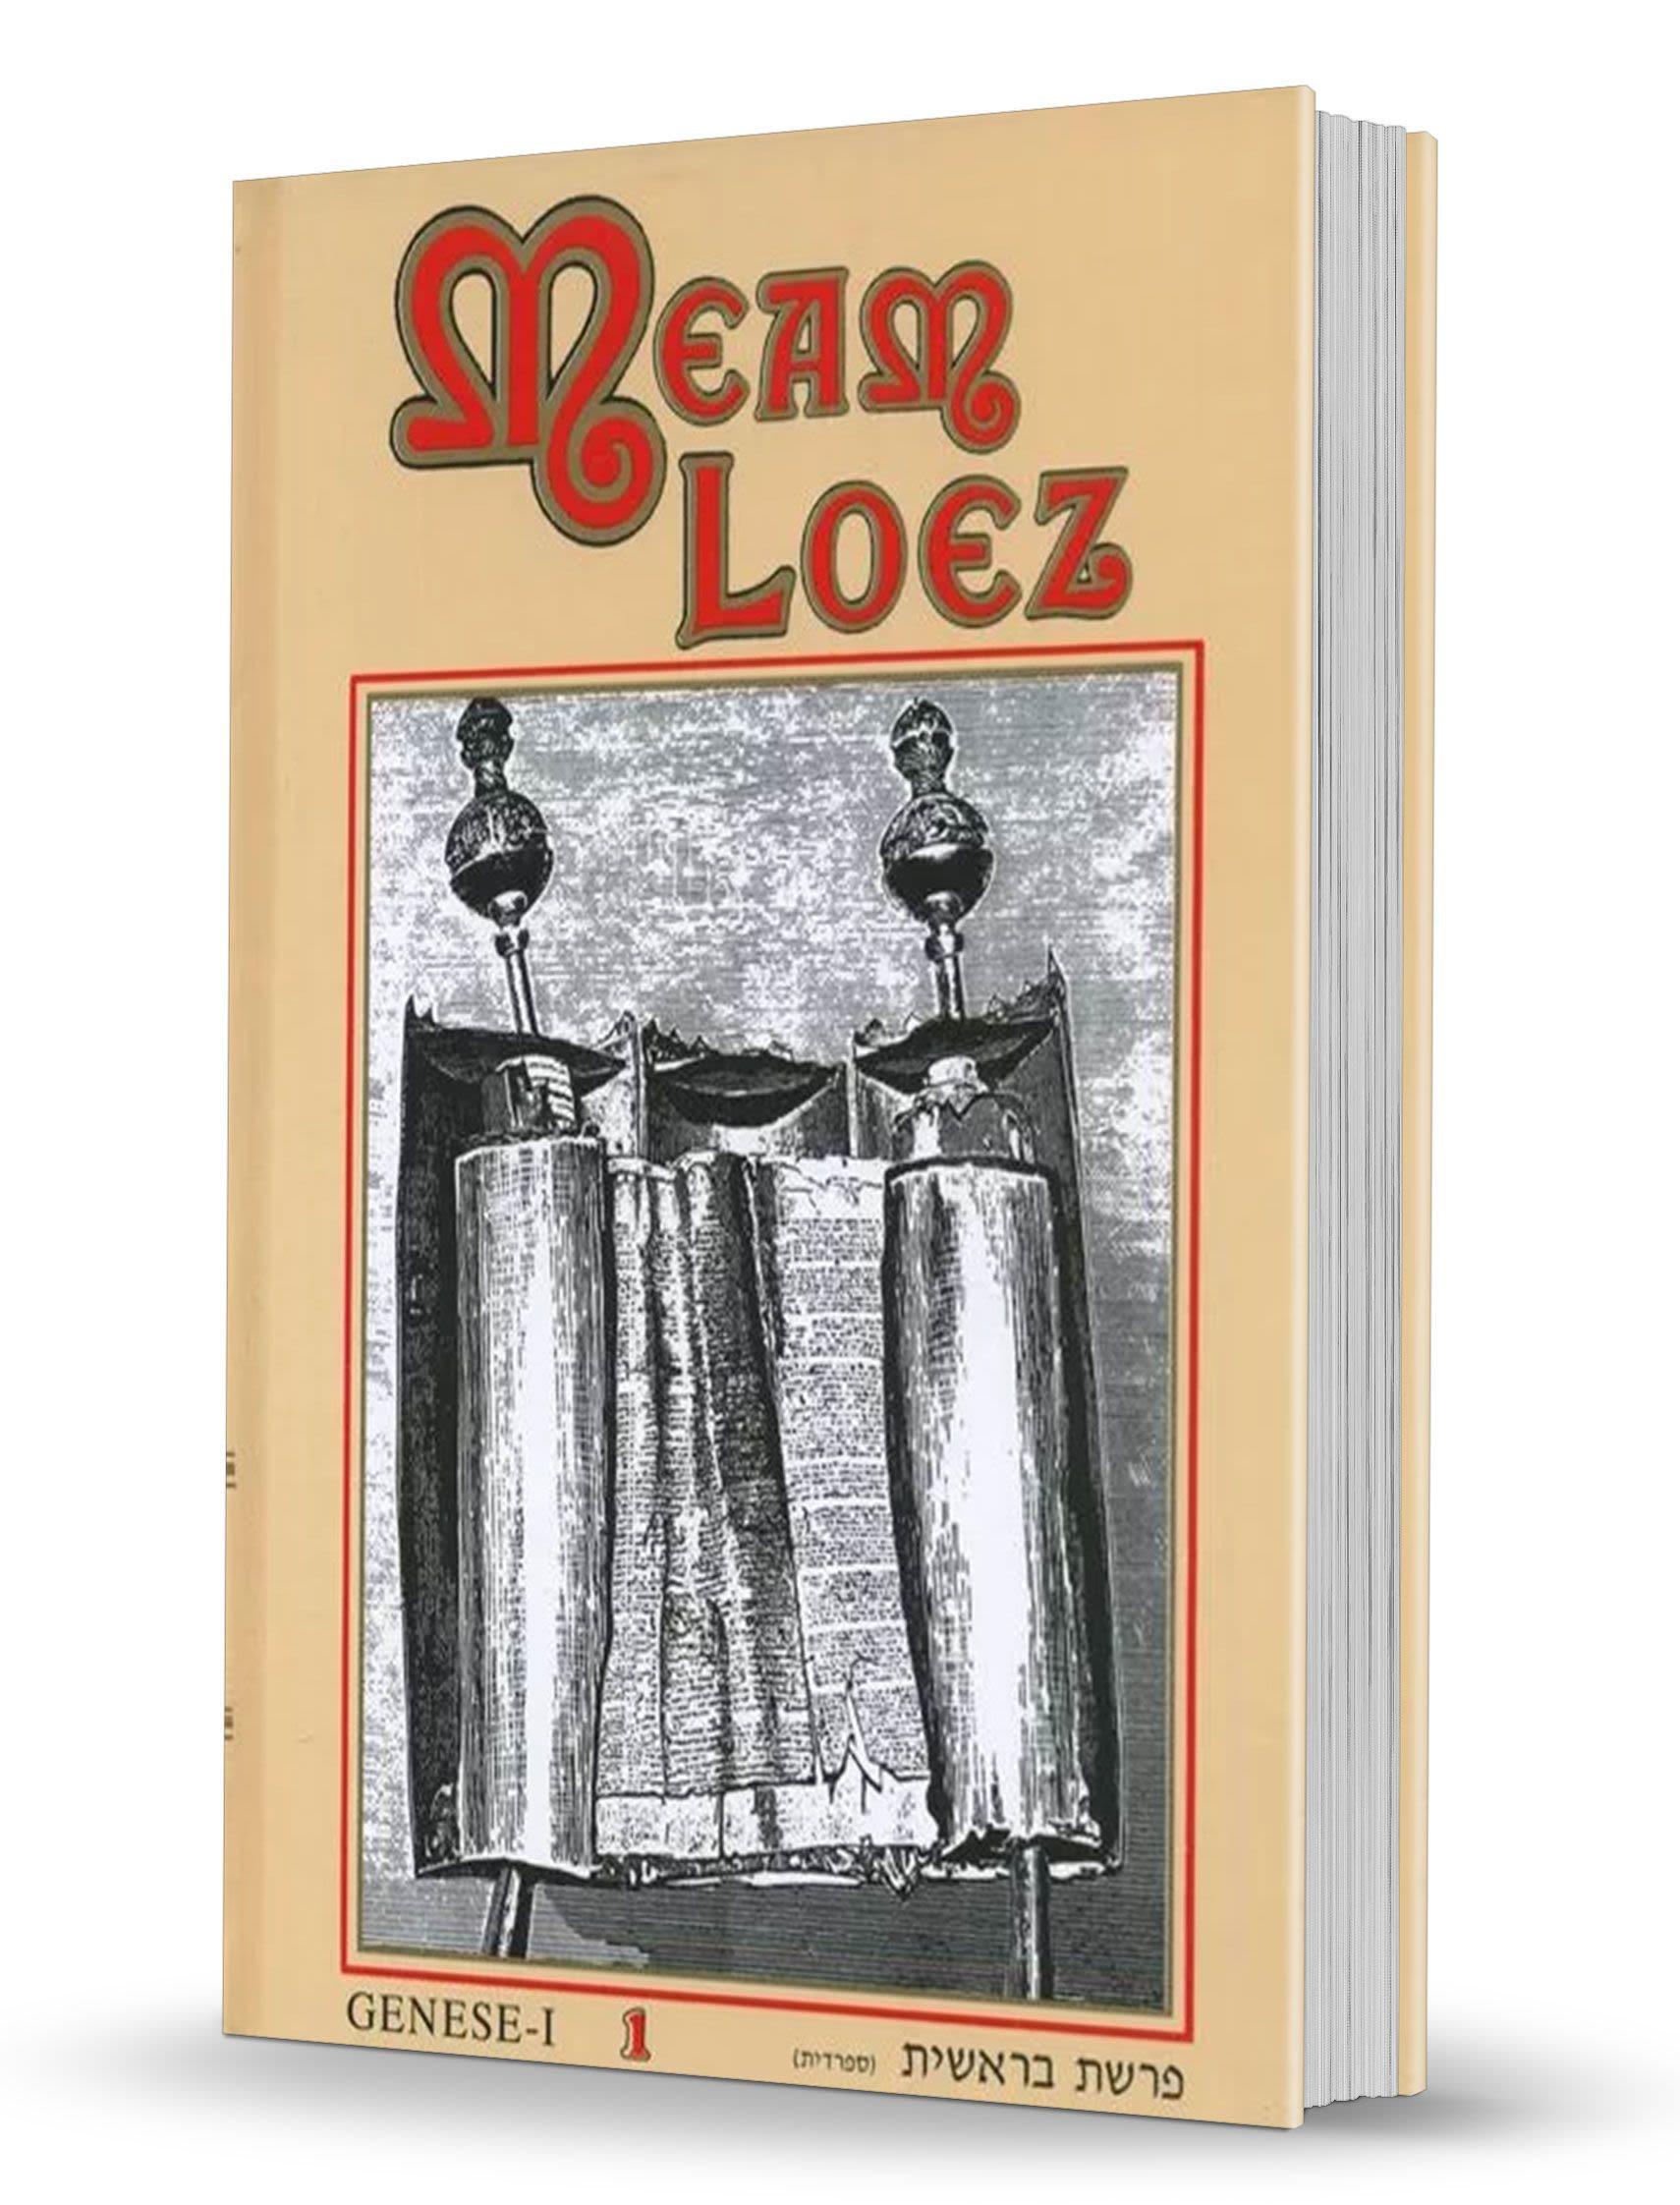 La Antología de la Torá - Meam Loez - 1er Tomo - Bereshit (Génesis)